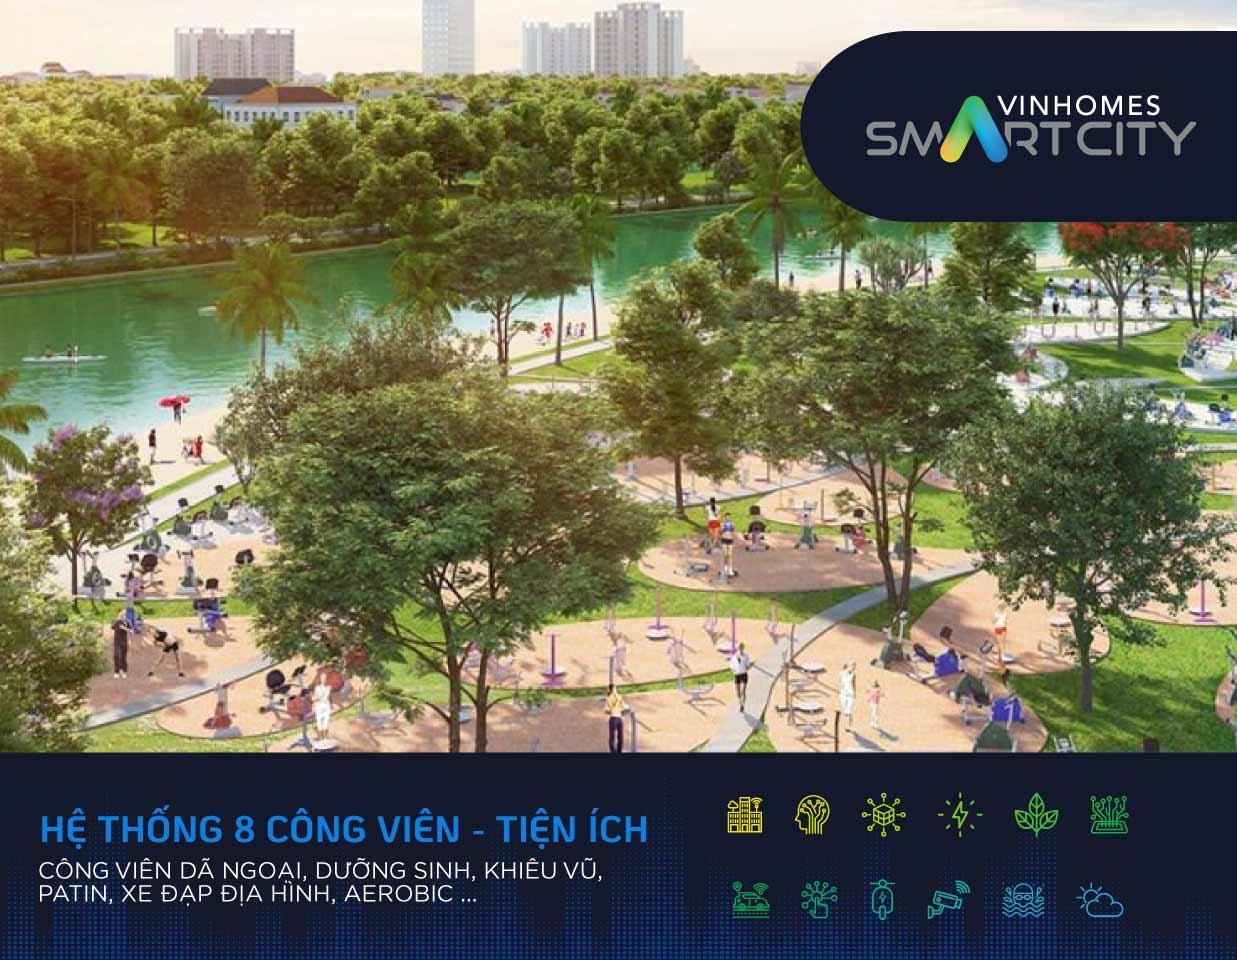 he-thong-cong-vien-tai-vinhomes-smart-city.jpg